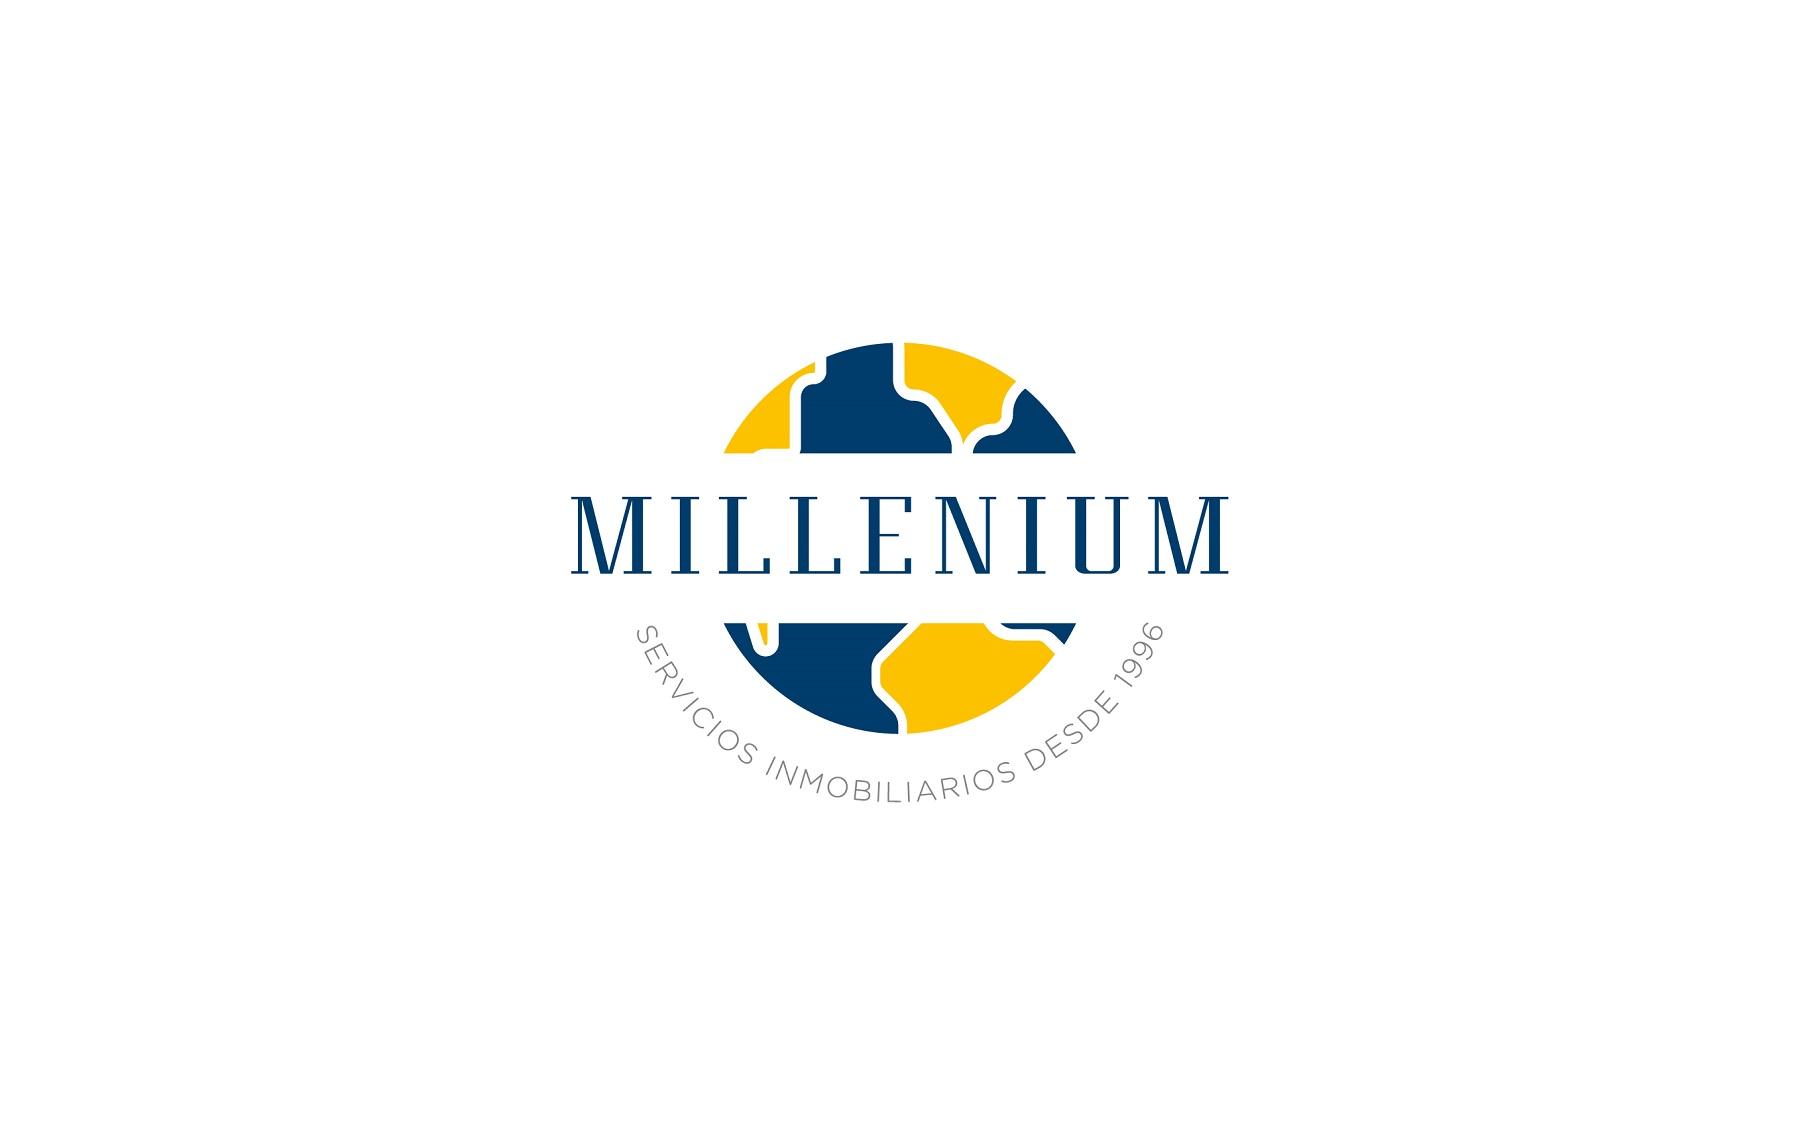 NUEVO LOGO MILLENIUM 2019.jpg2_4.jpg